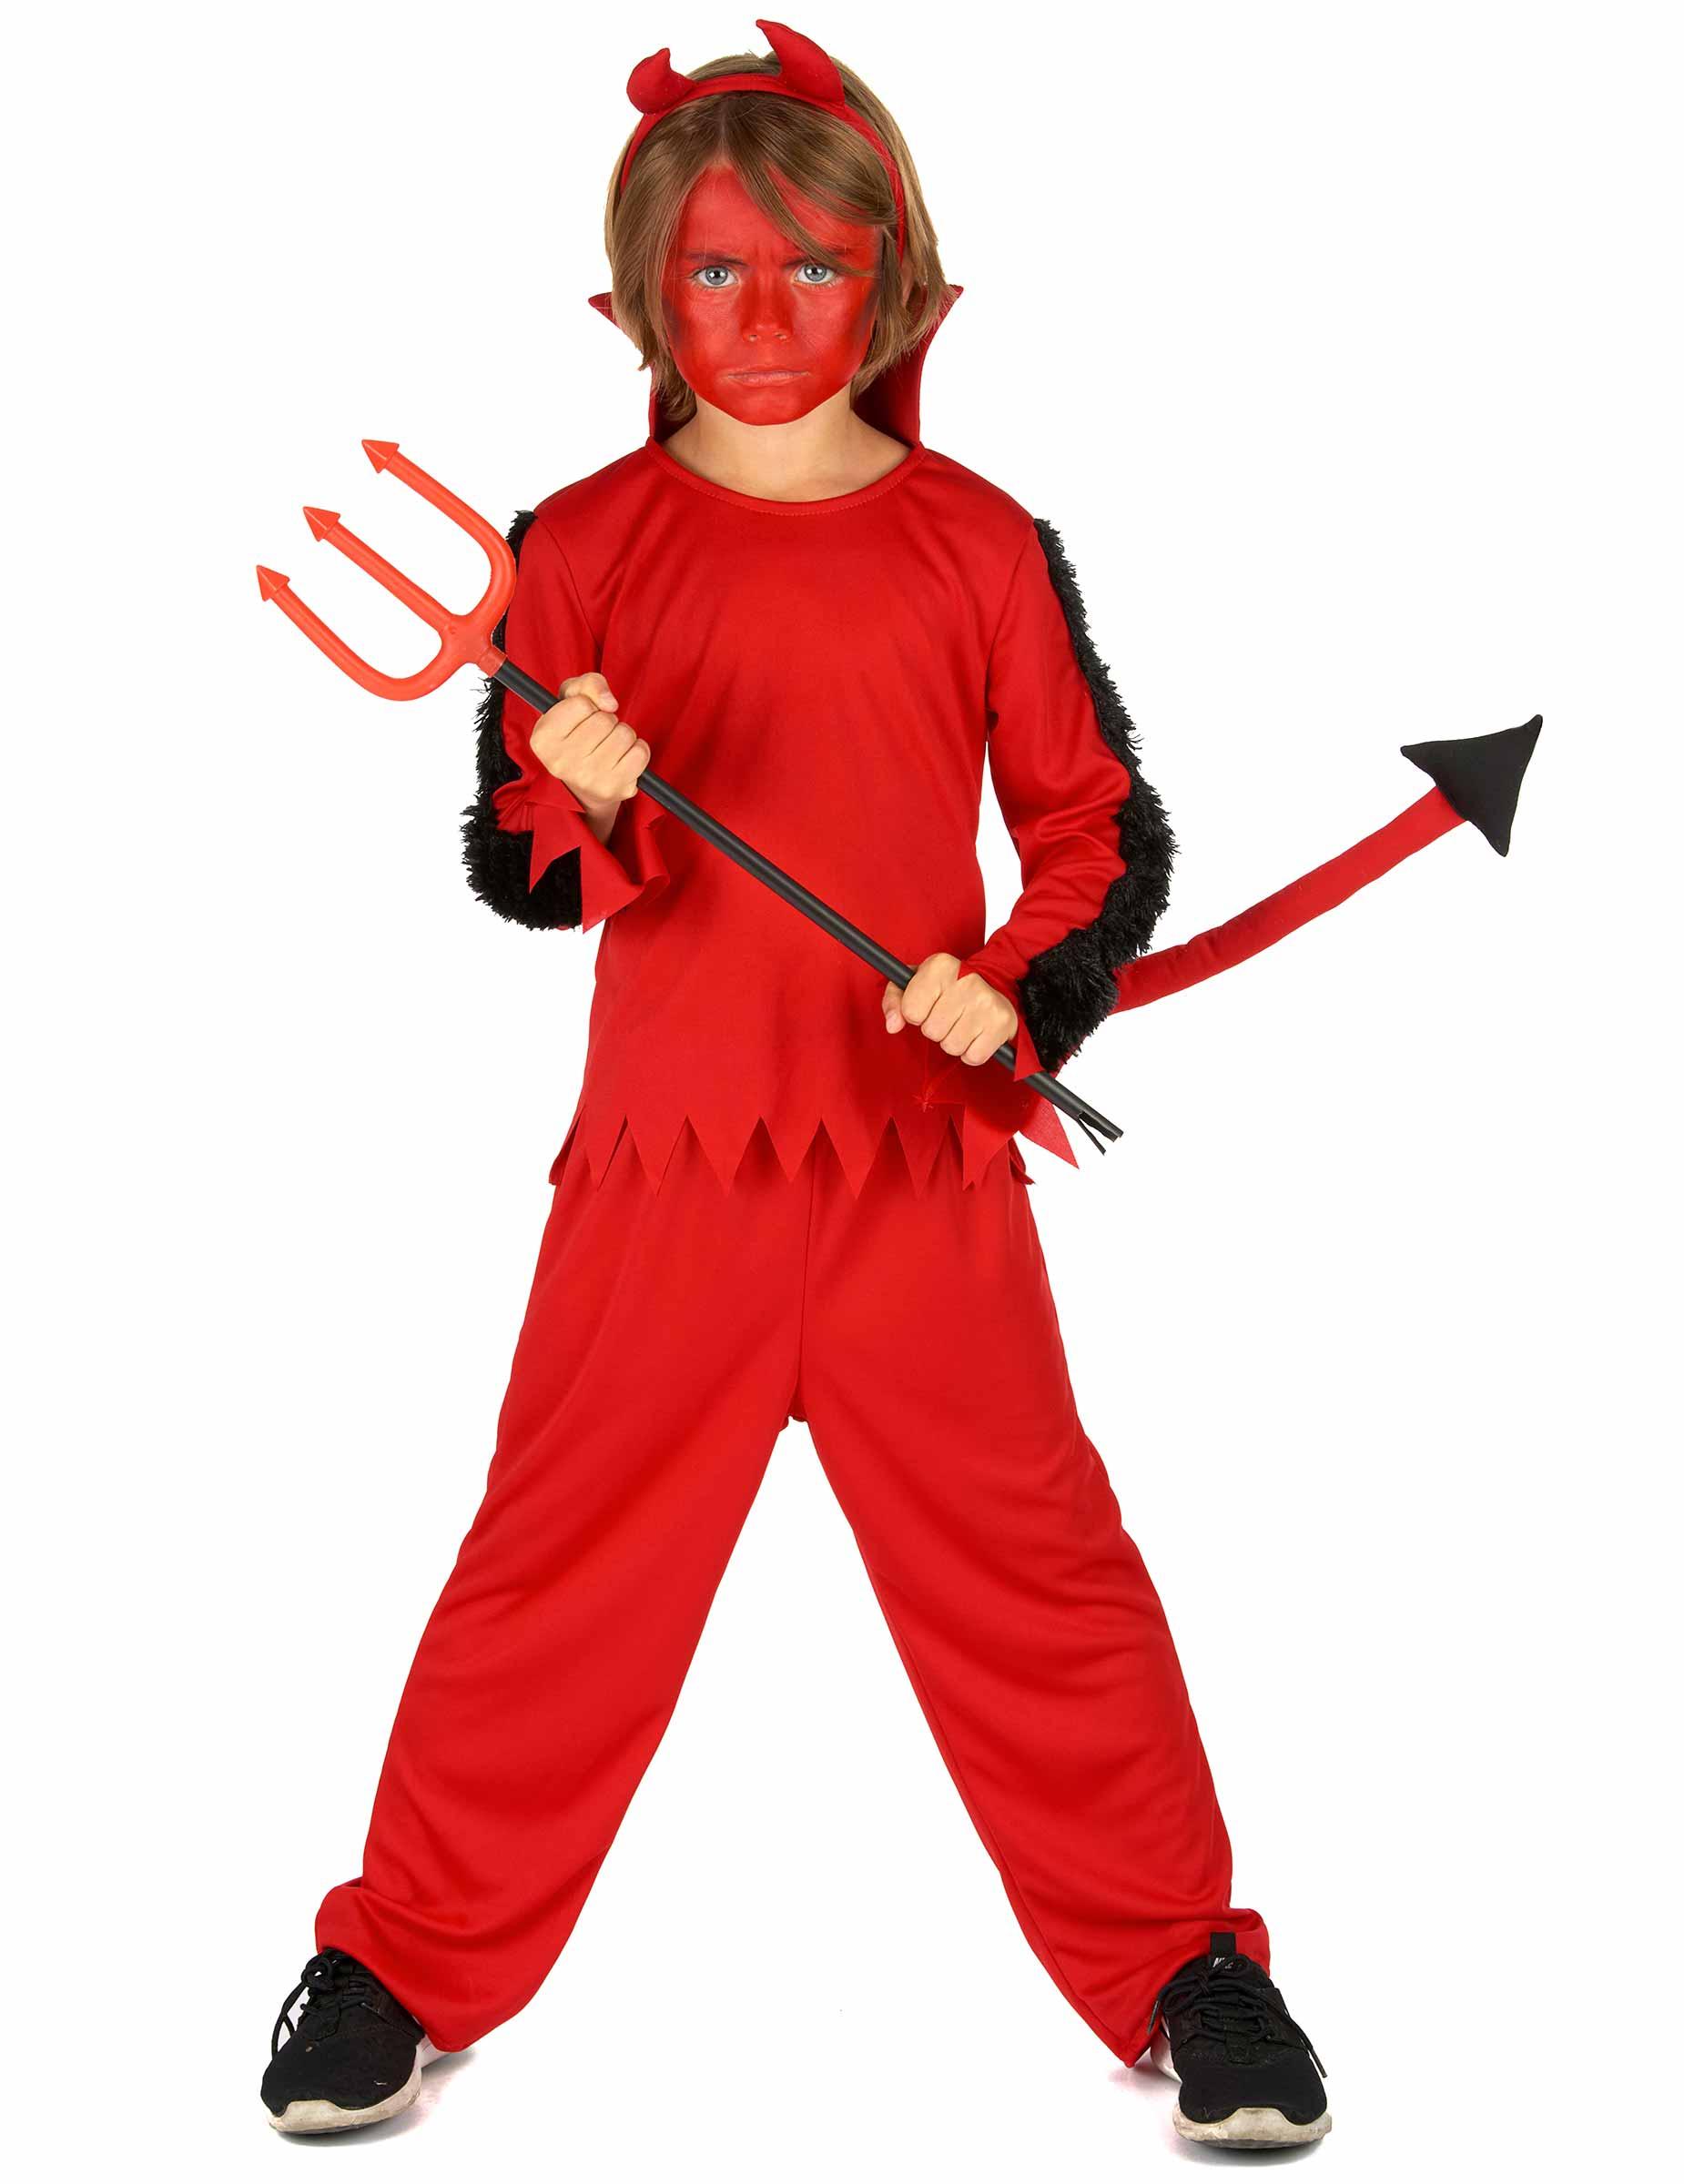 Deguisetoi Déguisement Diable Garçon Halloween - Taille: 5 - 6 ans (S)